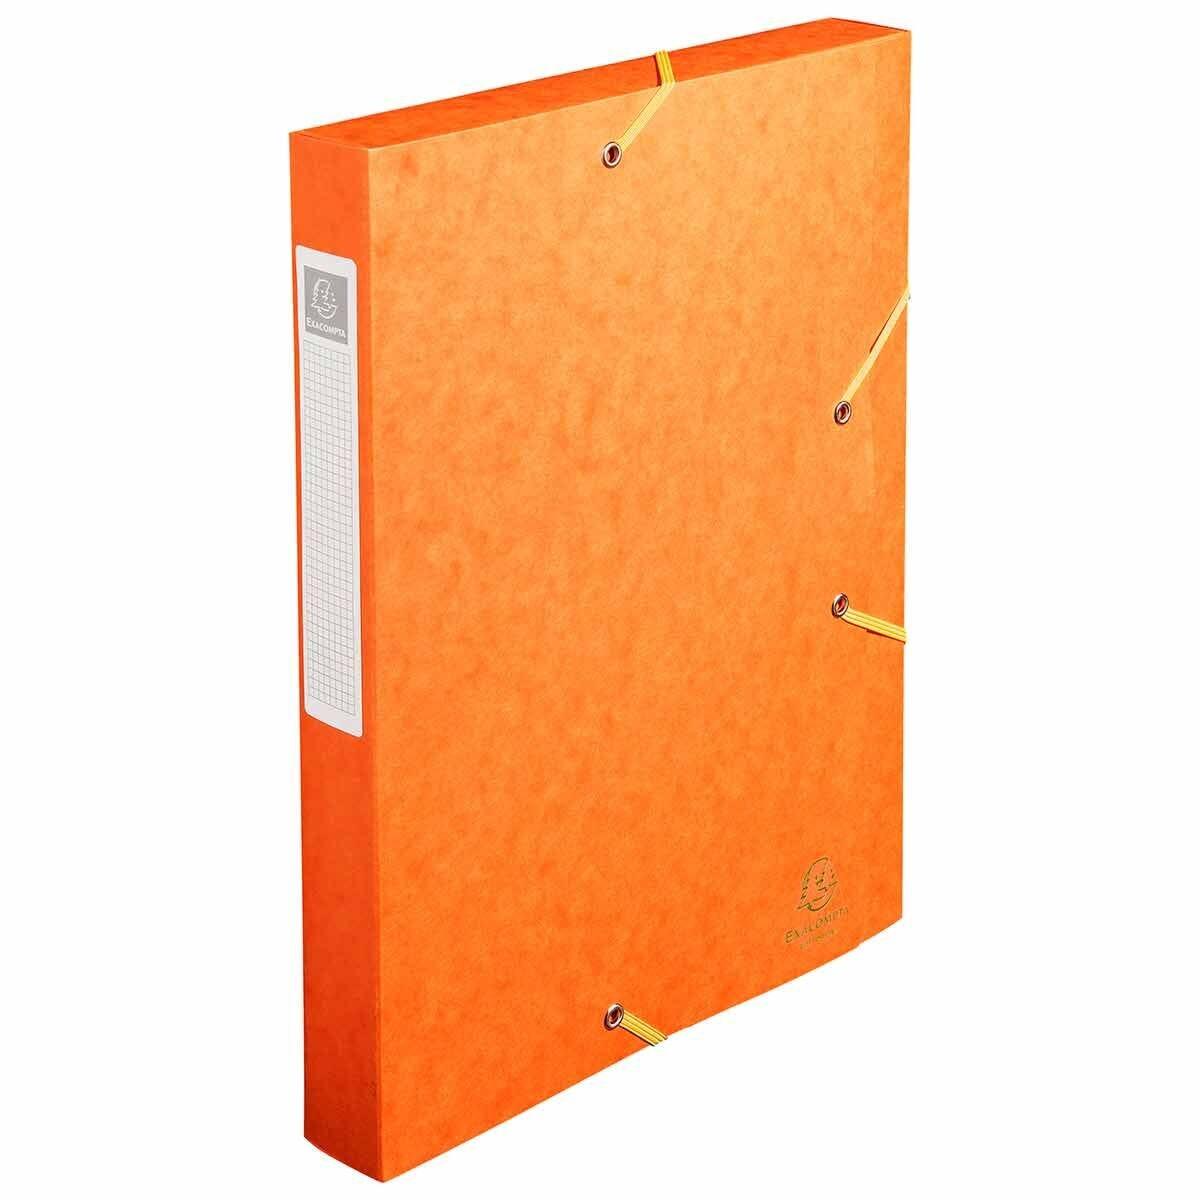 Exacompta Elasticated Box File Pressboard A4 40mm Pack of 10 Orange